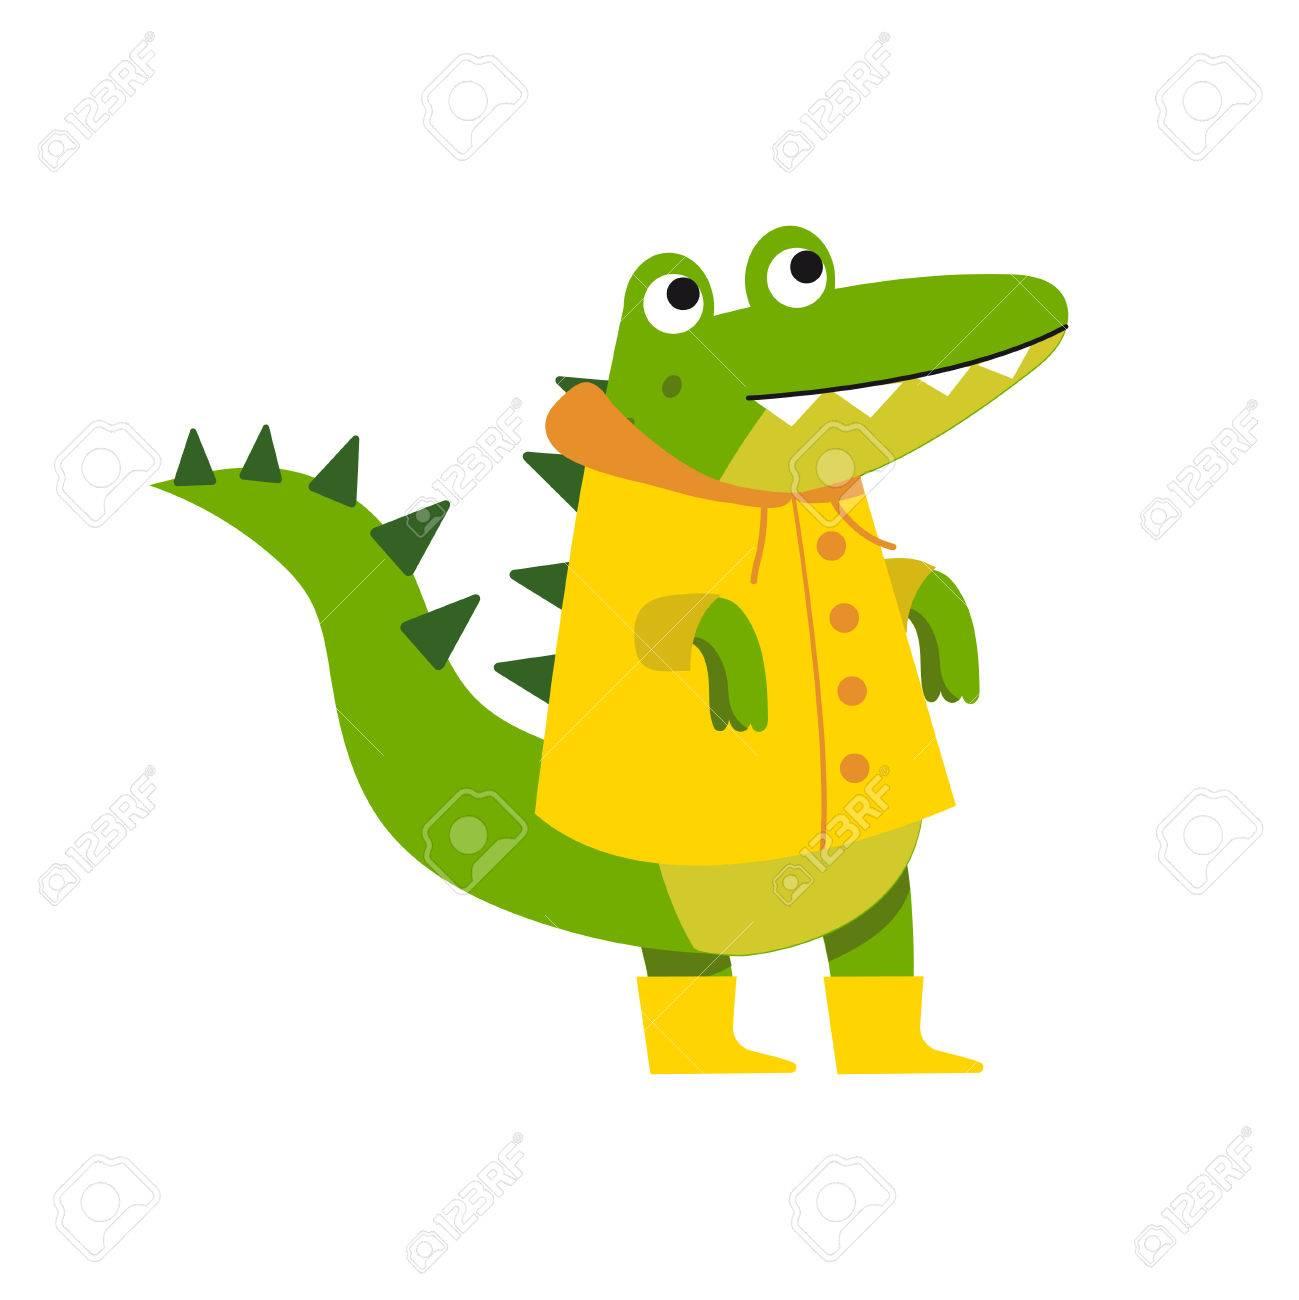 https://previews.123rf.com/images/emojiimage/emojiimage1706/emojiimage170600082/80123538-cute-cartoon-crocodile-character-walking-wearing-yellow-raincoat--Stock-Photo.jpg